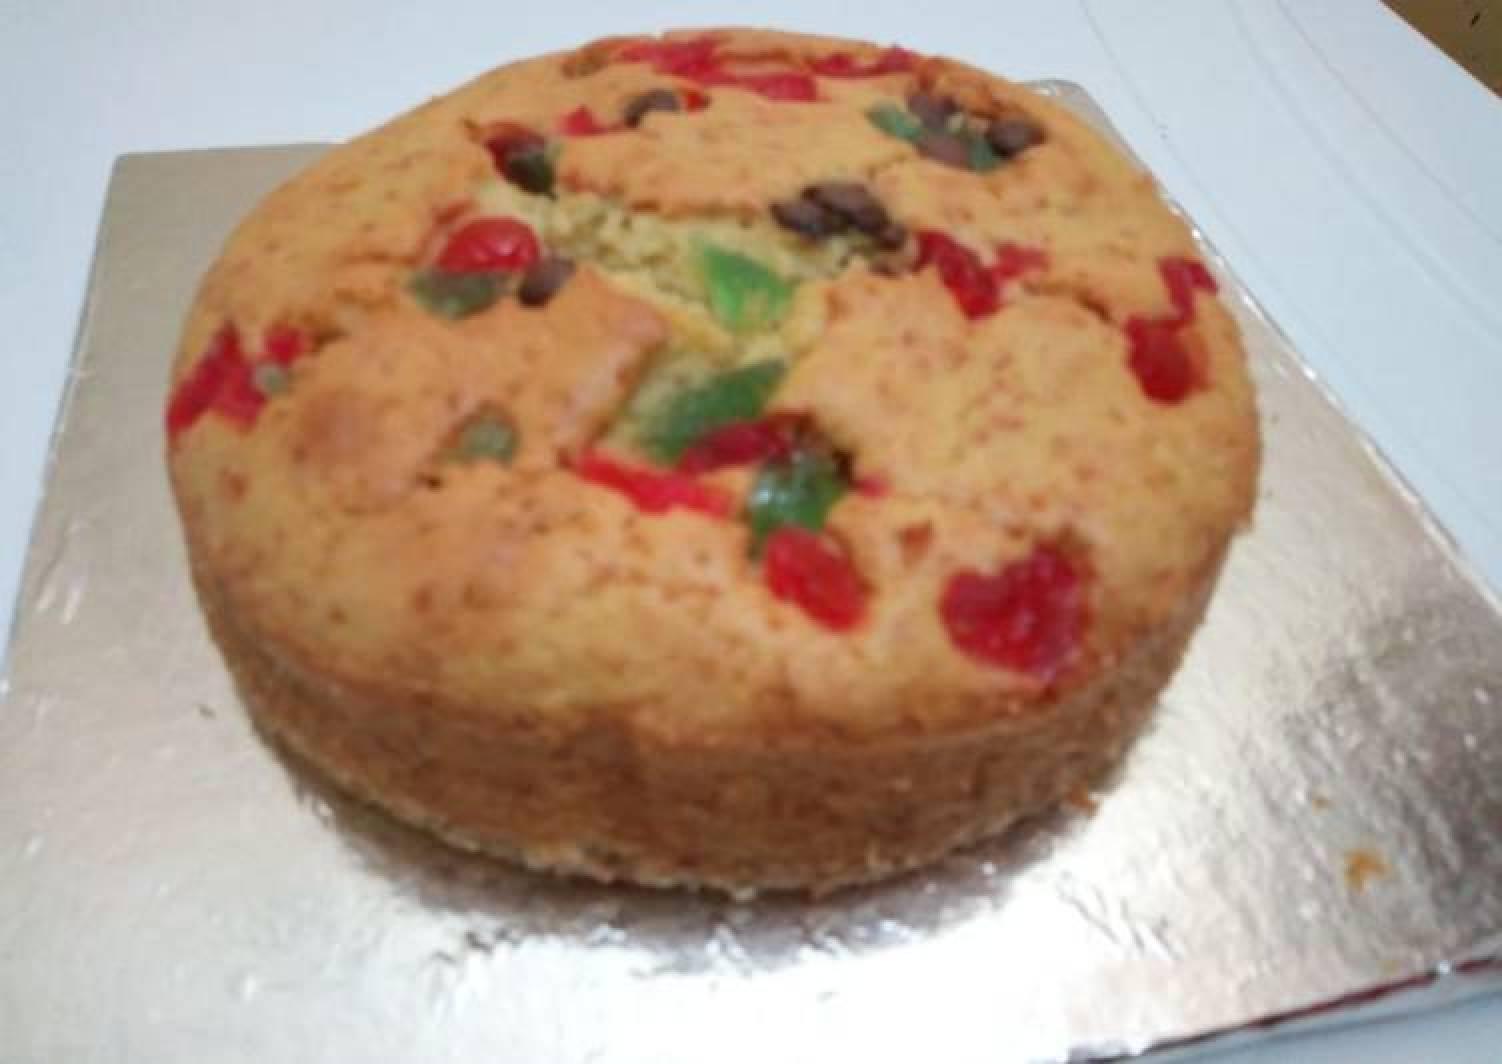 Vanilla cake with cherries #revival contest